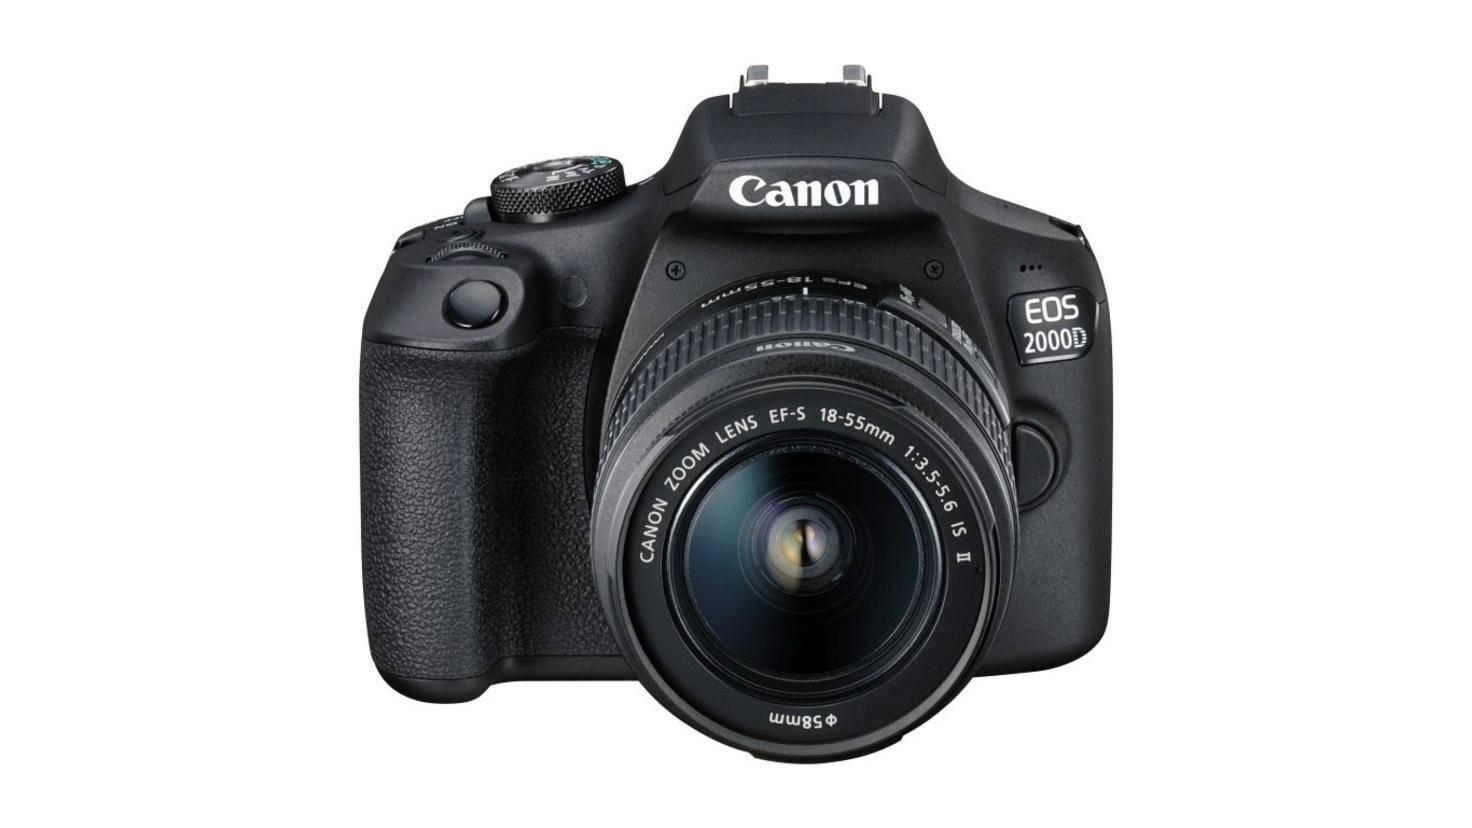 canon-eos-2000d-dslr